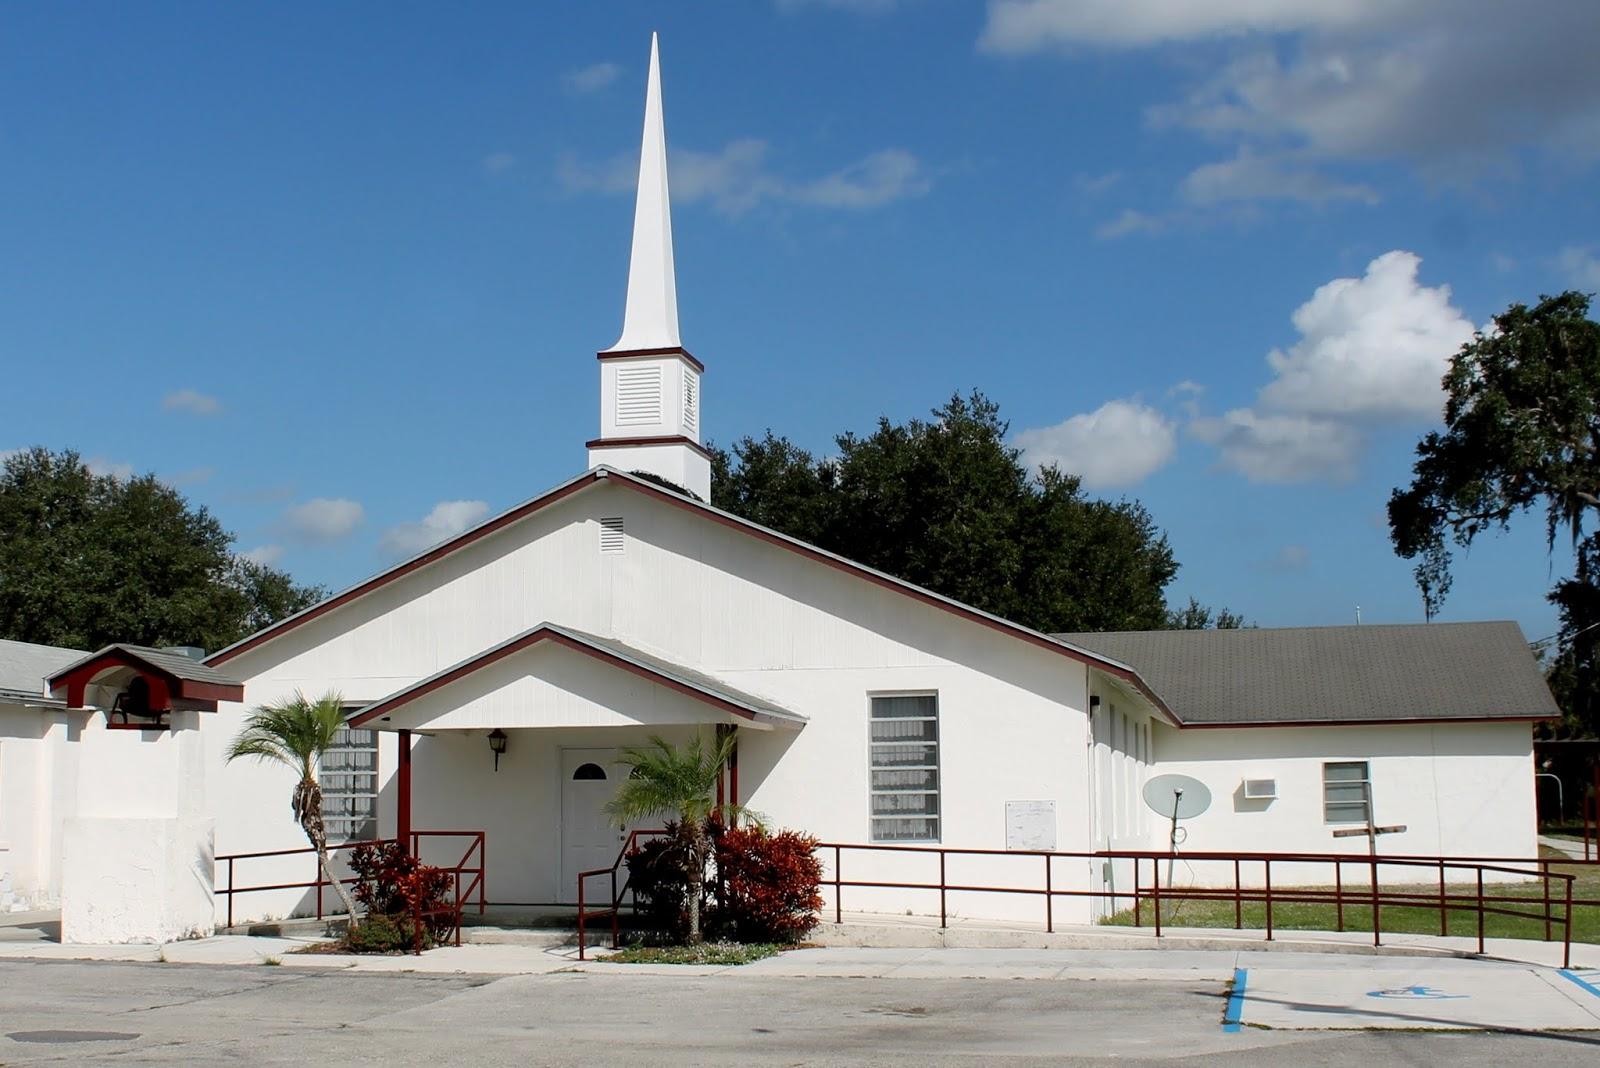 Iglesia en Reservation Rd